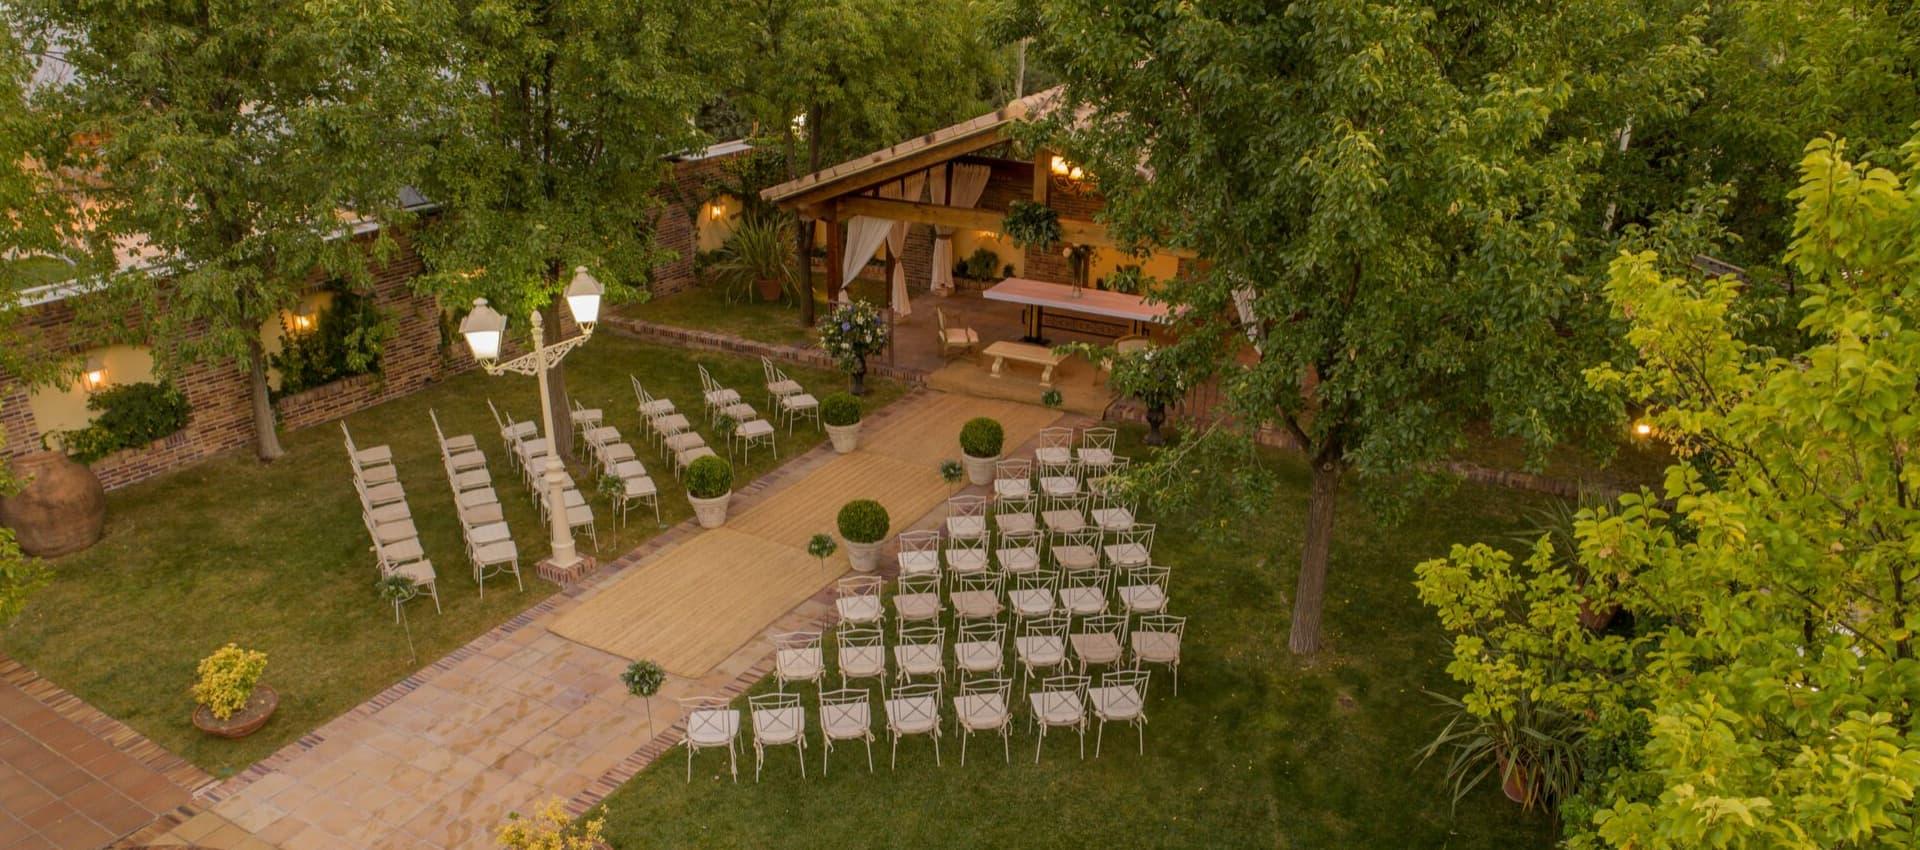 bodas en jardines en madrid